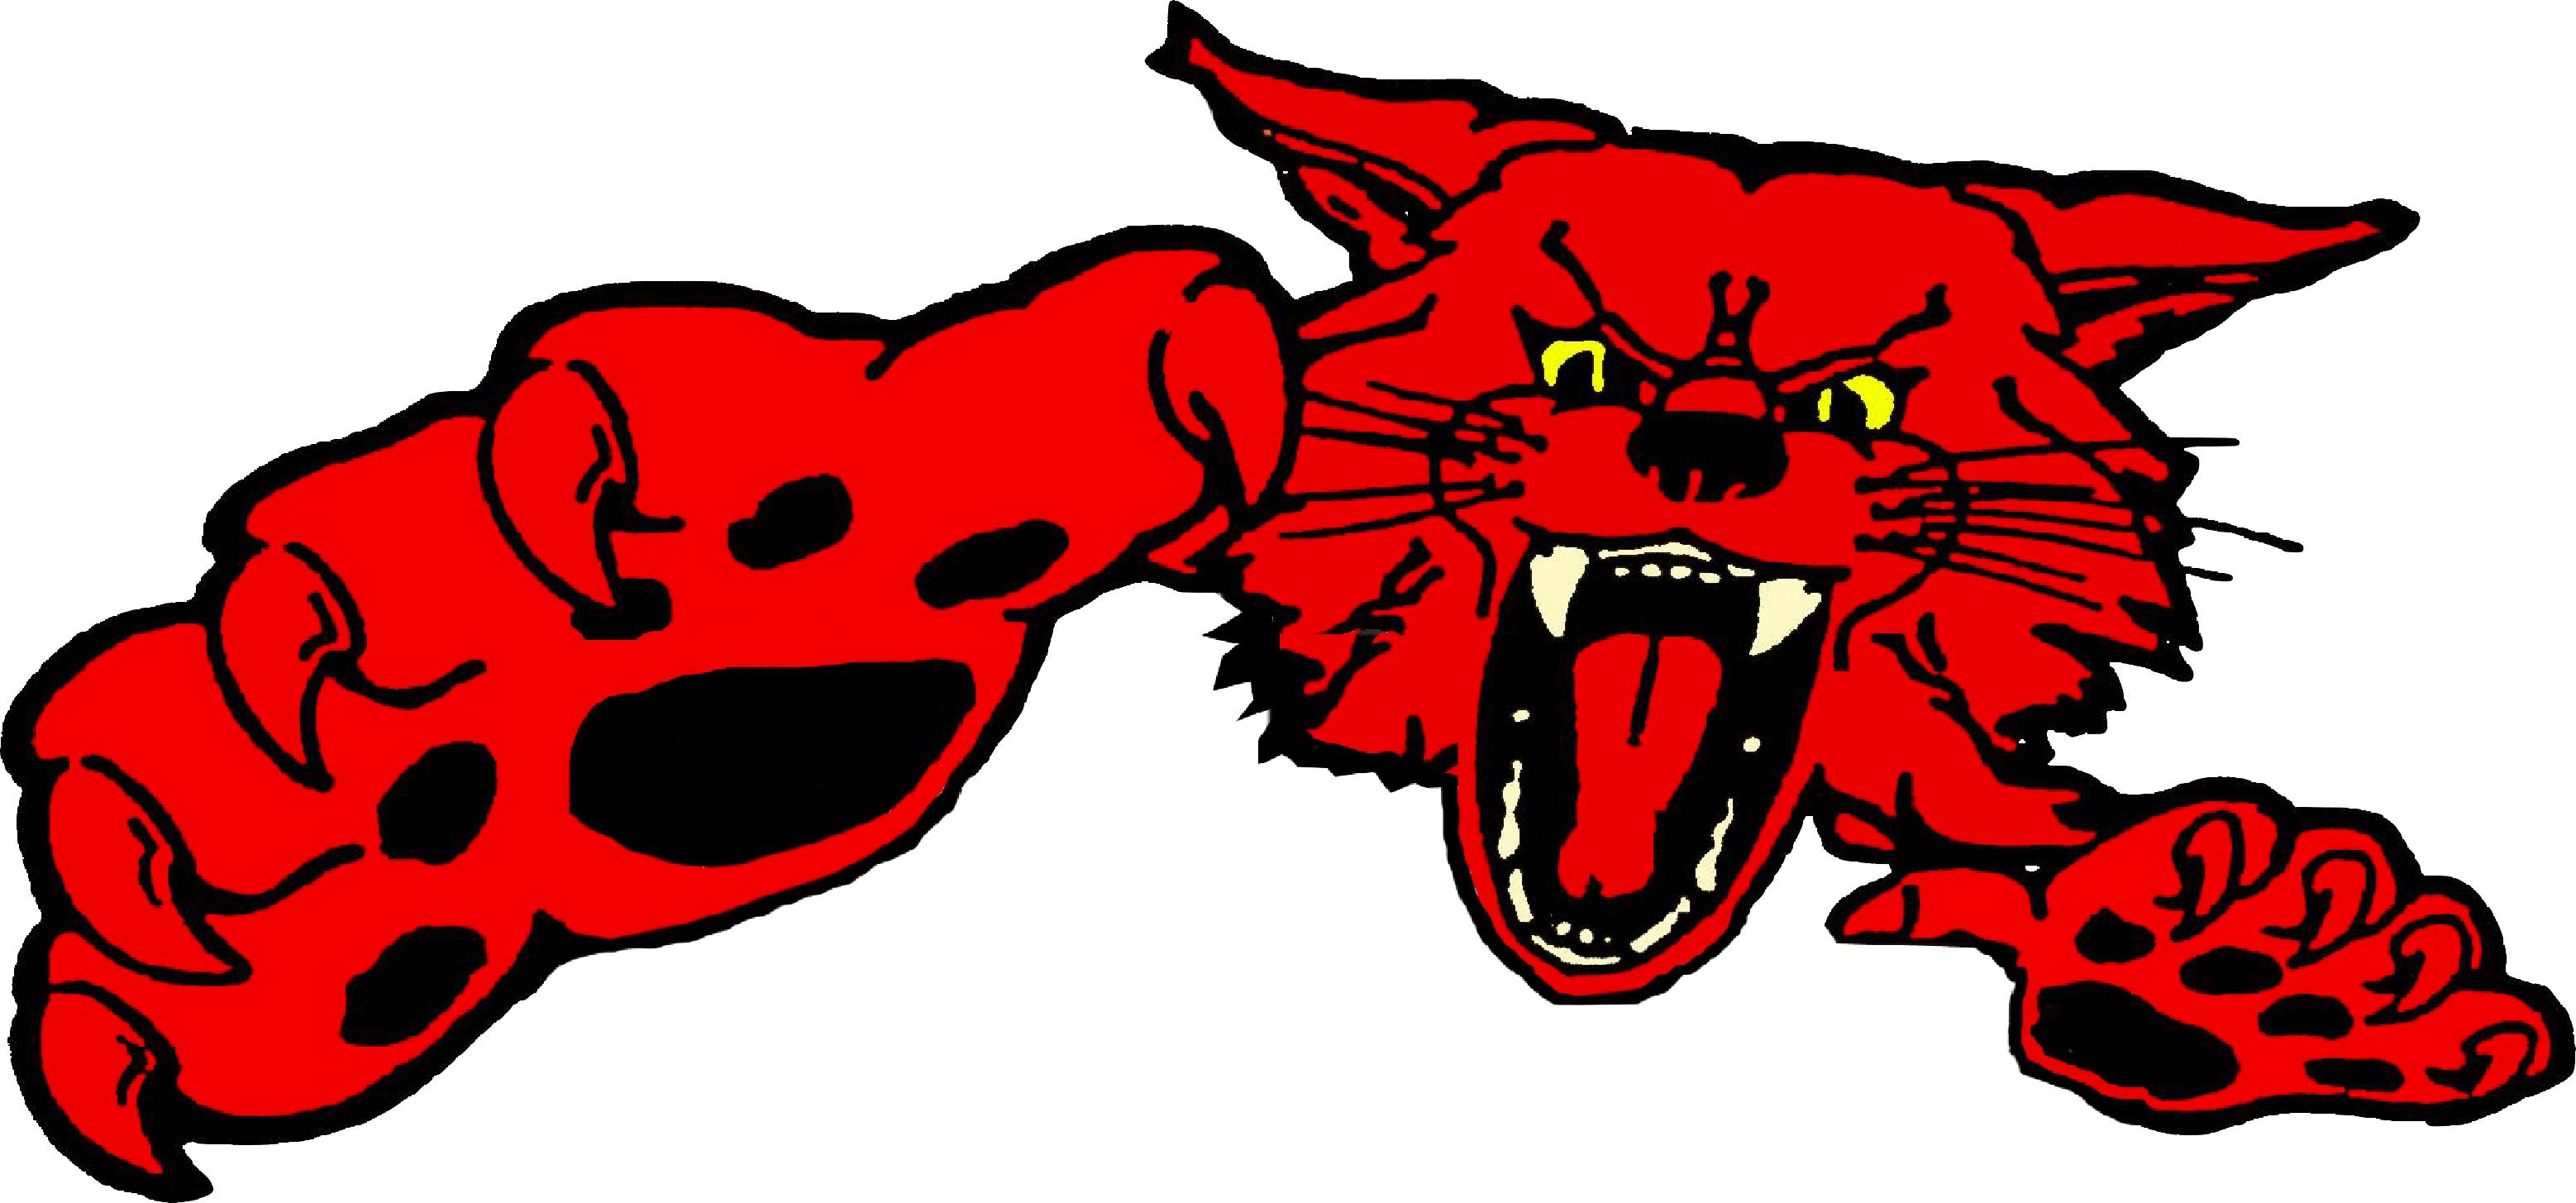 Uk Basketball Clip Art: Free Download Best Wildcat Logo